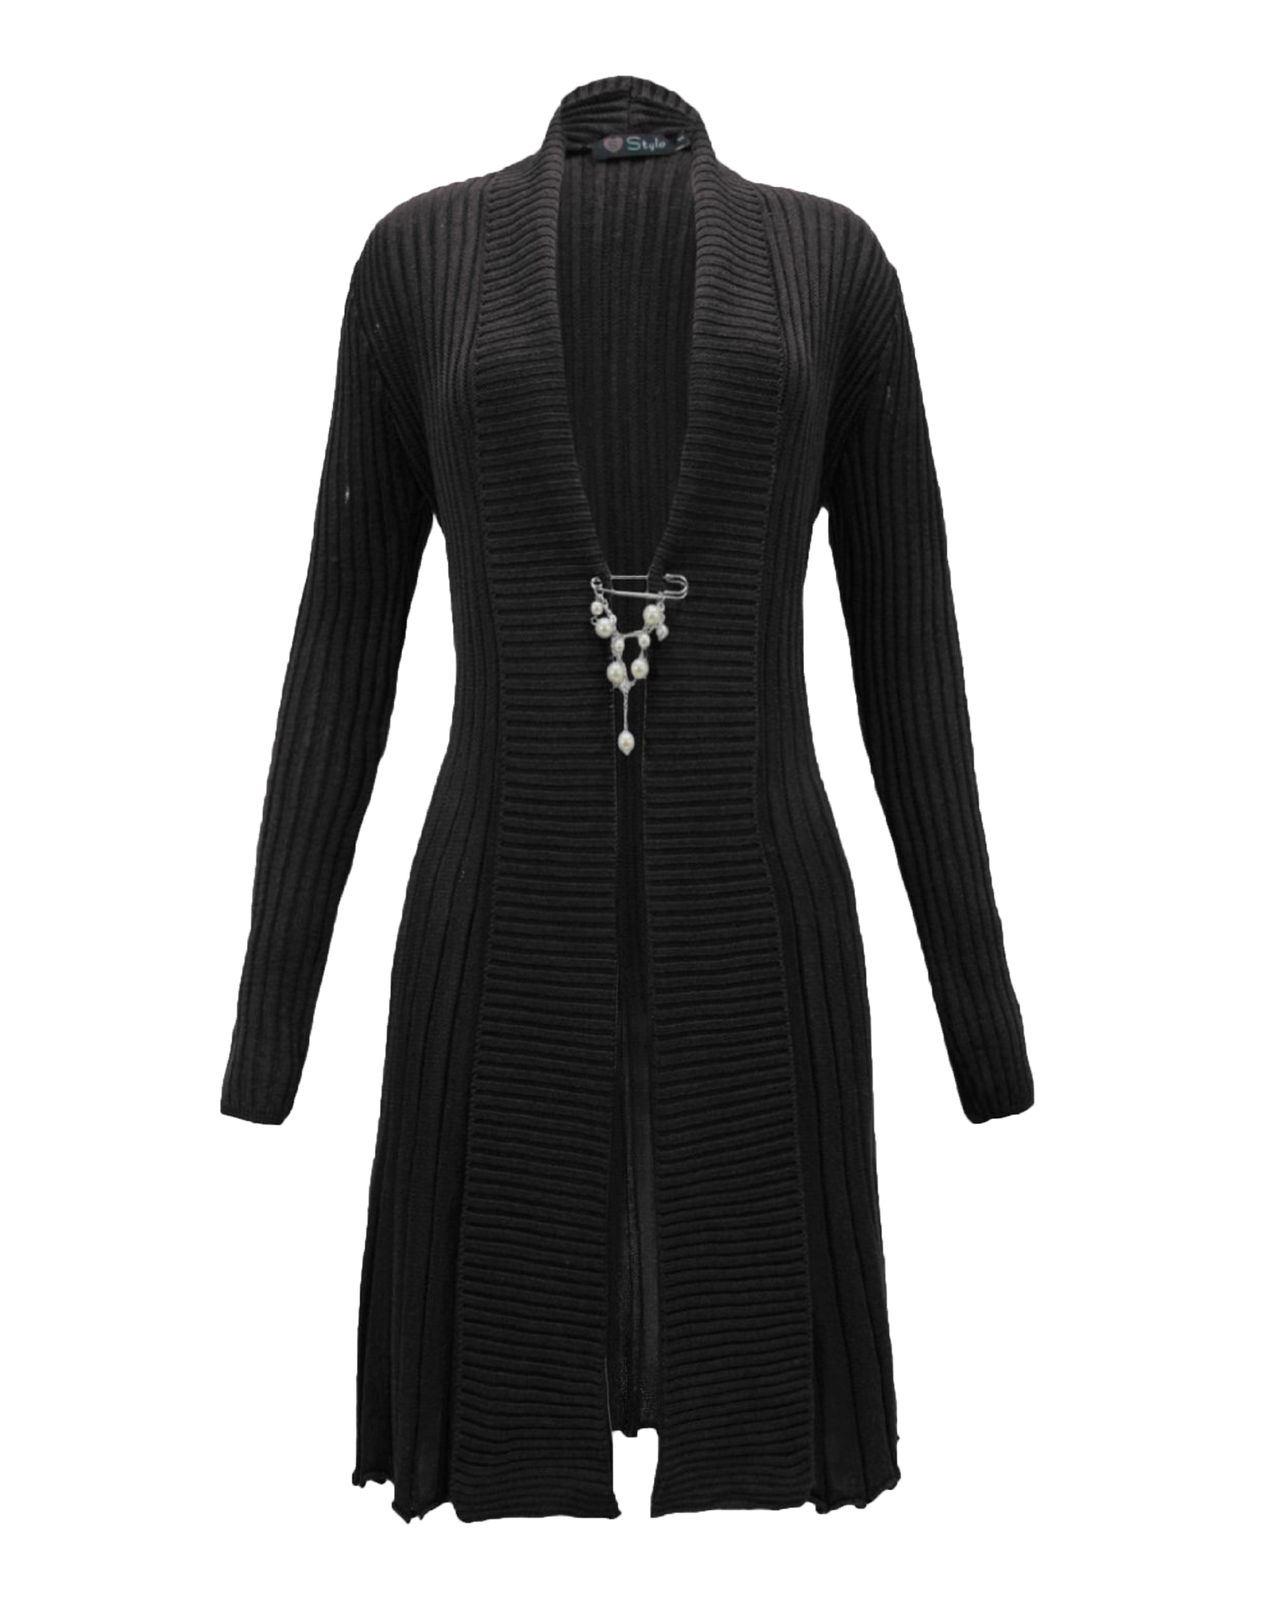 Ladies-Women-Knitted-Brooch-Boyfriend-Cardigan-Waterfall-Summer-Dress-Top-Jumper thumbnail 10